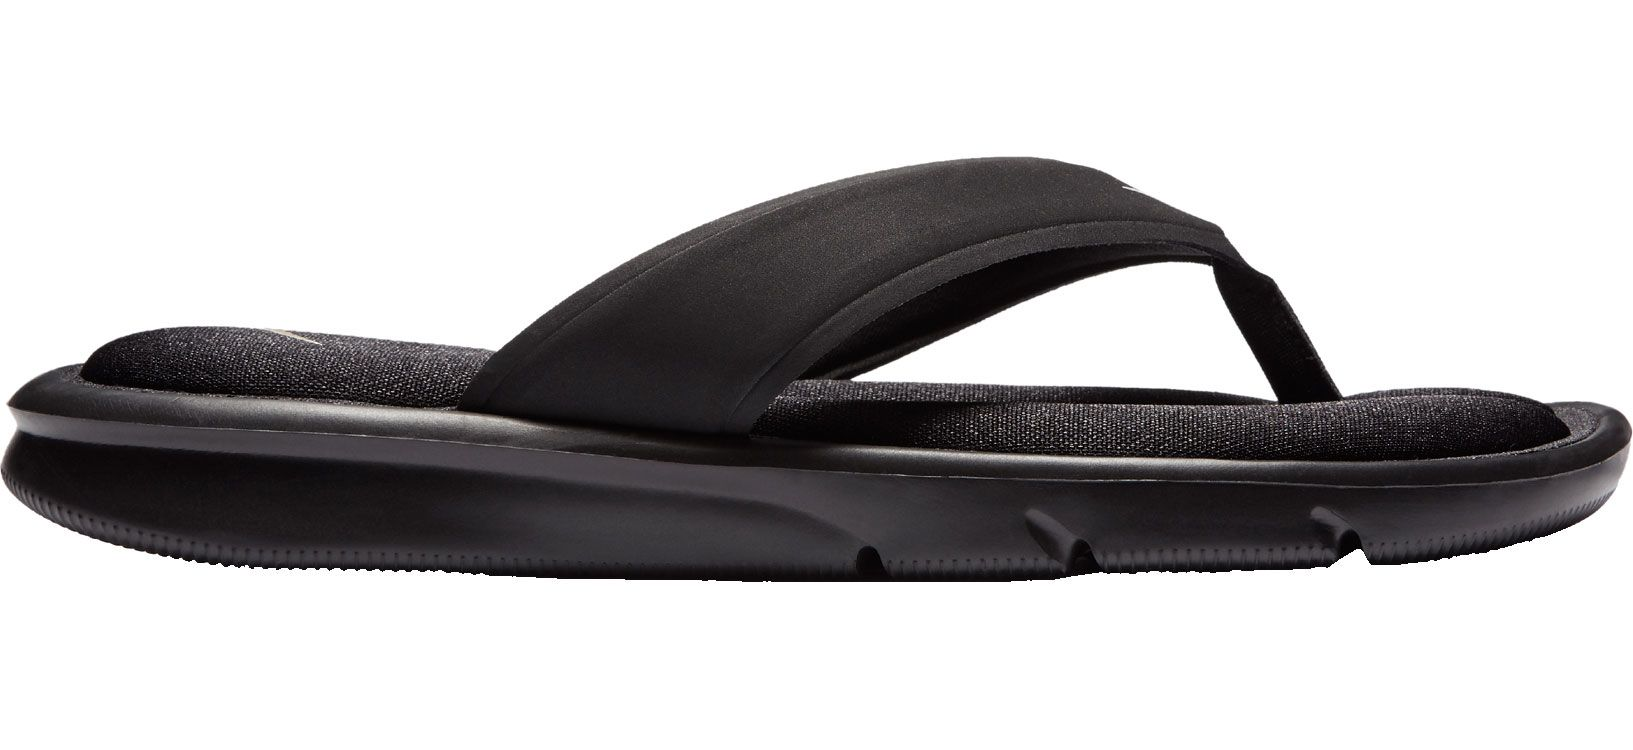 Cheap Sale Prices Happy Feet NCAA Comfy Flop Thong Slipper(Children's) -Kansas Jayhawks For Nice E5JAt8